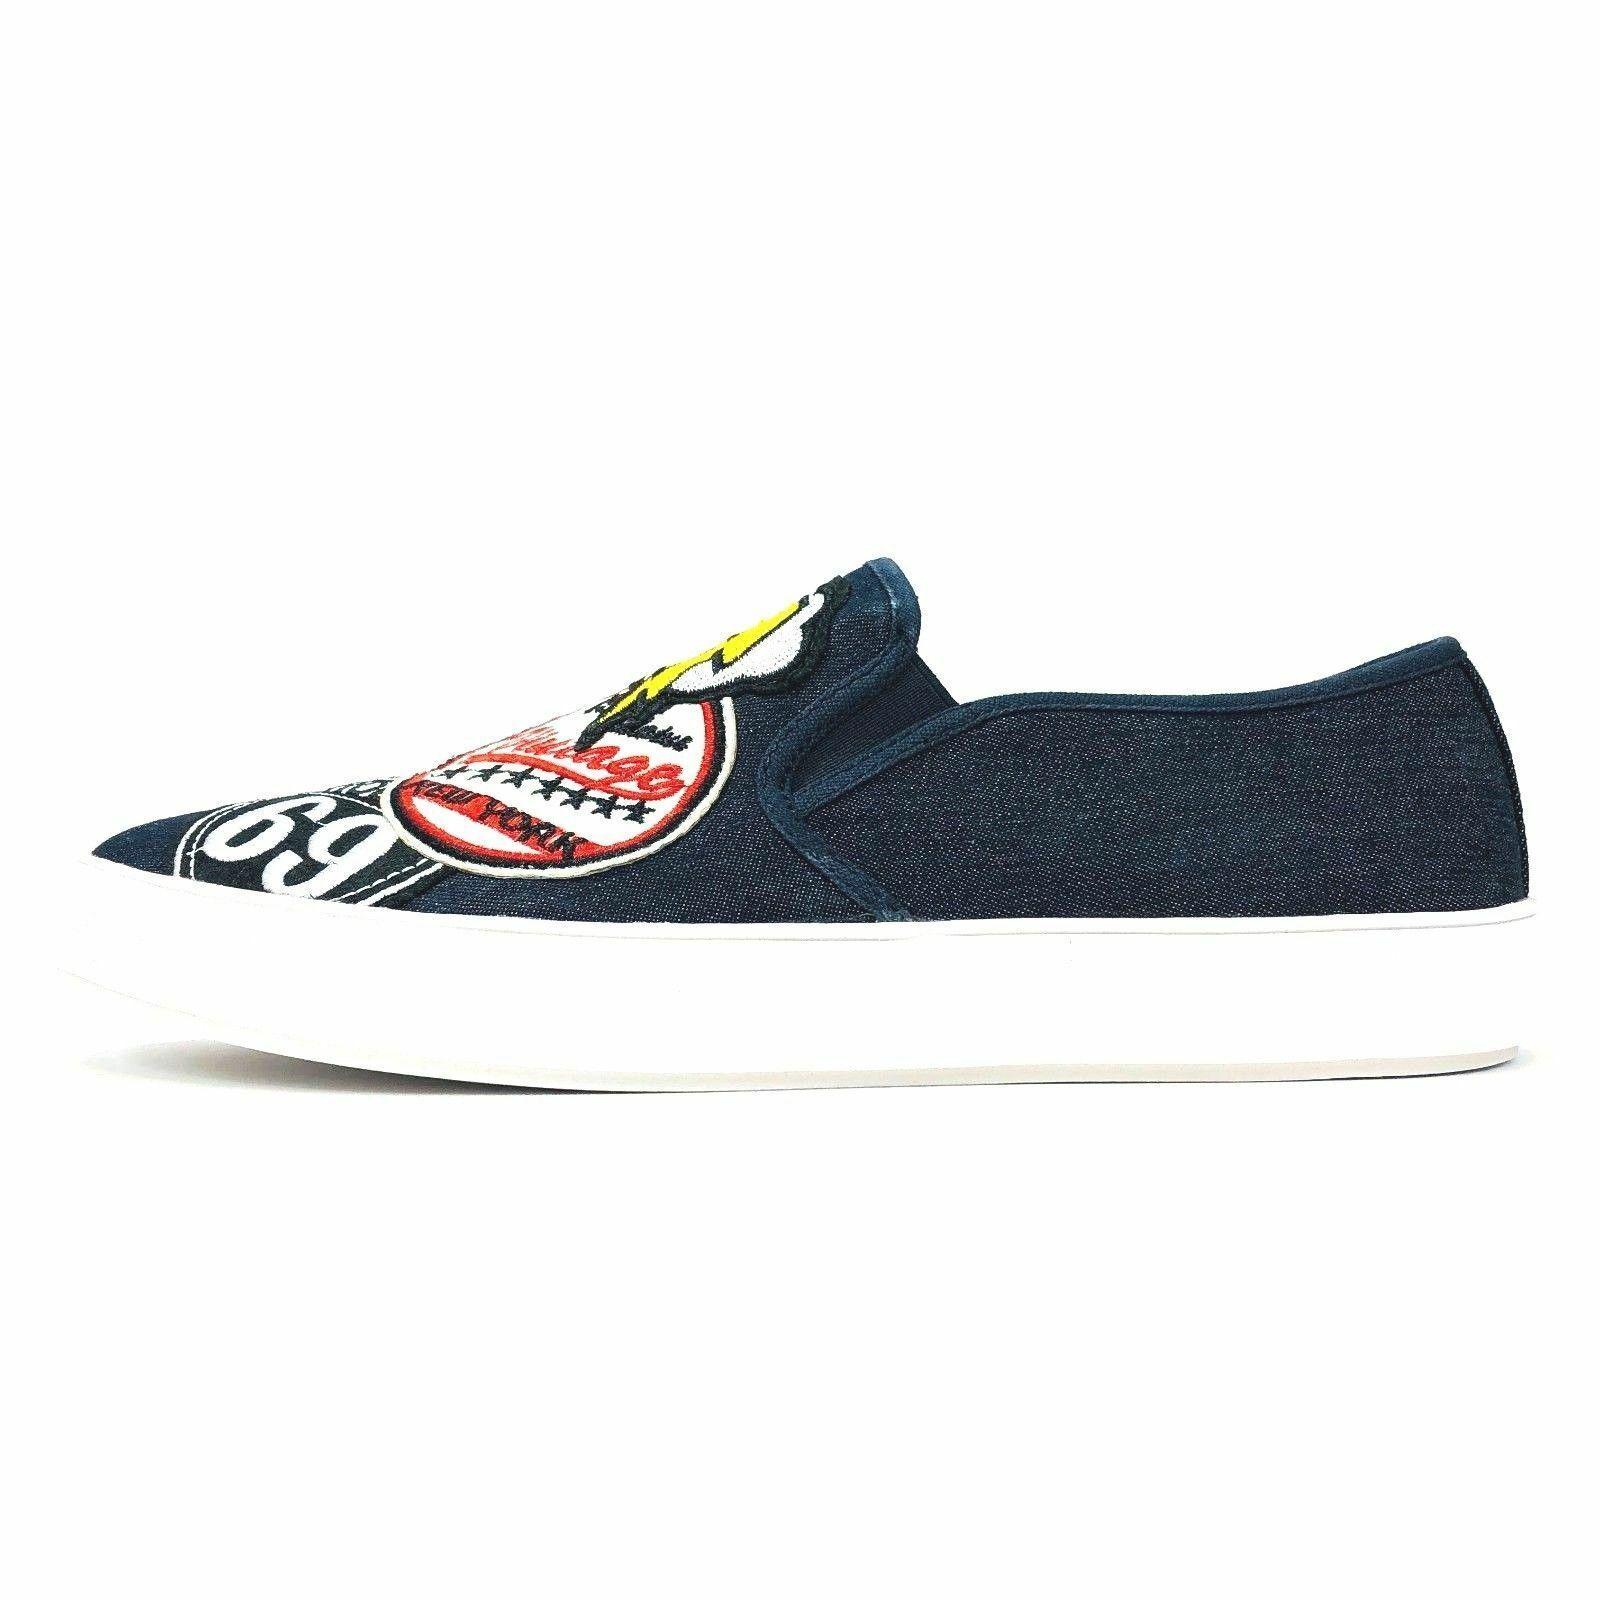 Steve Madden Wasdin Navy Blue or Military Denim Slip On Loafers Mens Vintage image 4